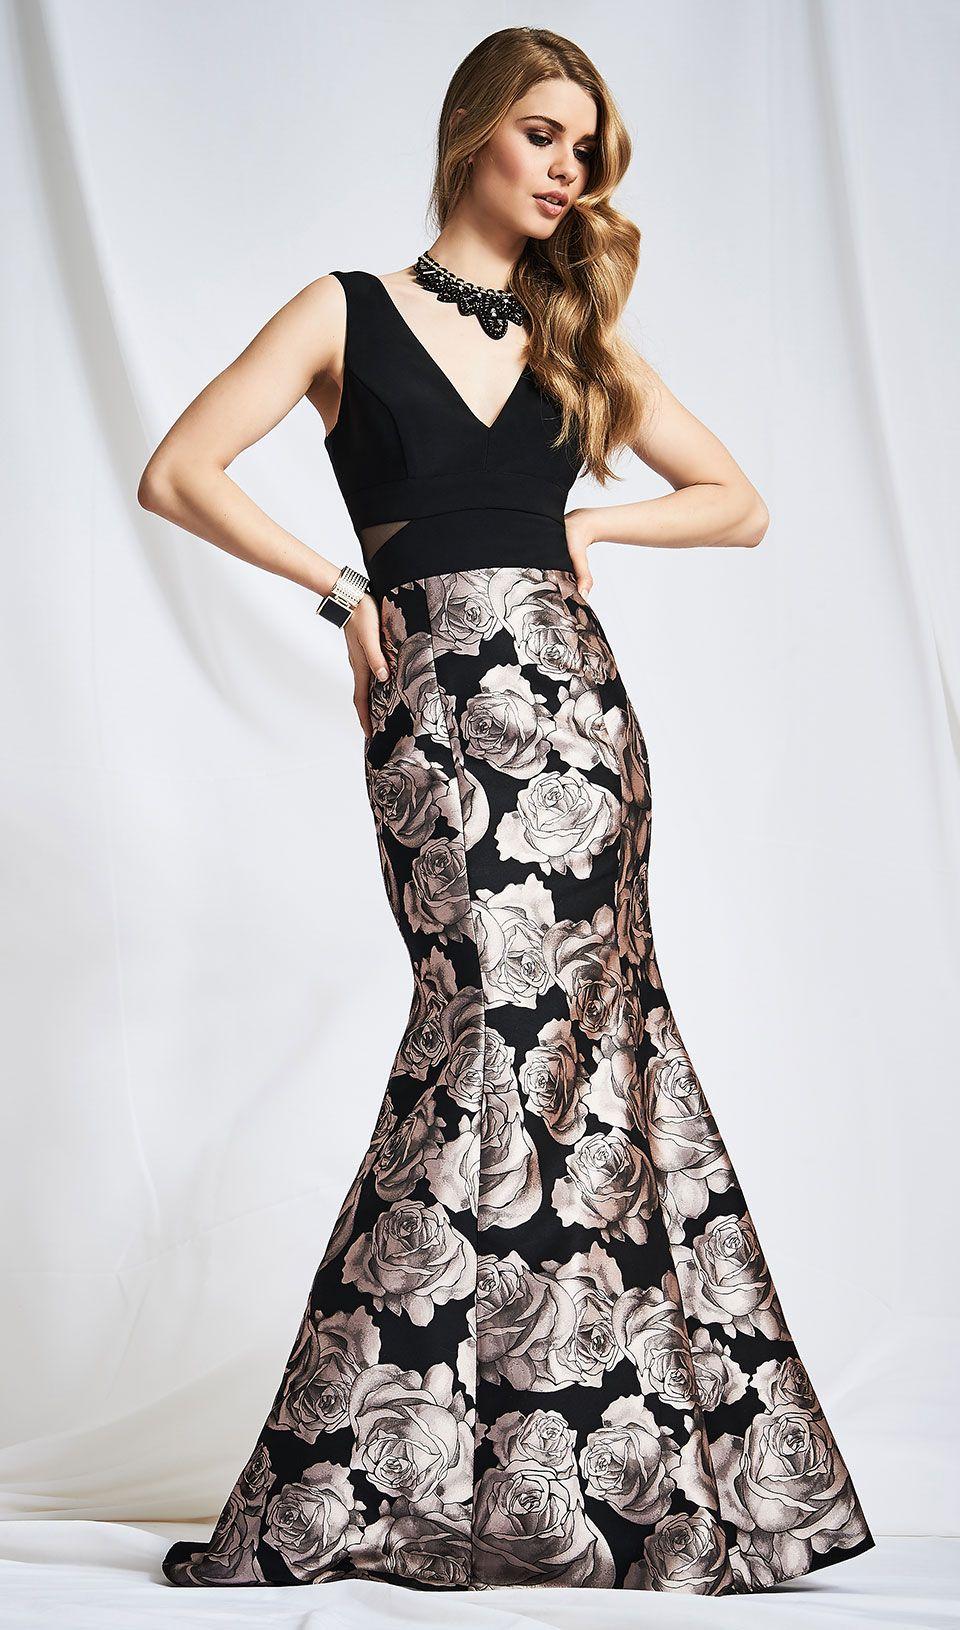 Pin by Melanie Lyne on Formal Dresses - PROM   Pinterest   Dress ...